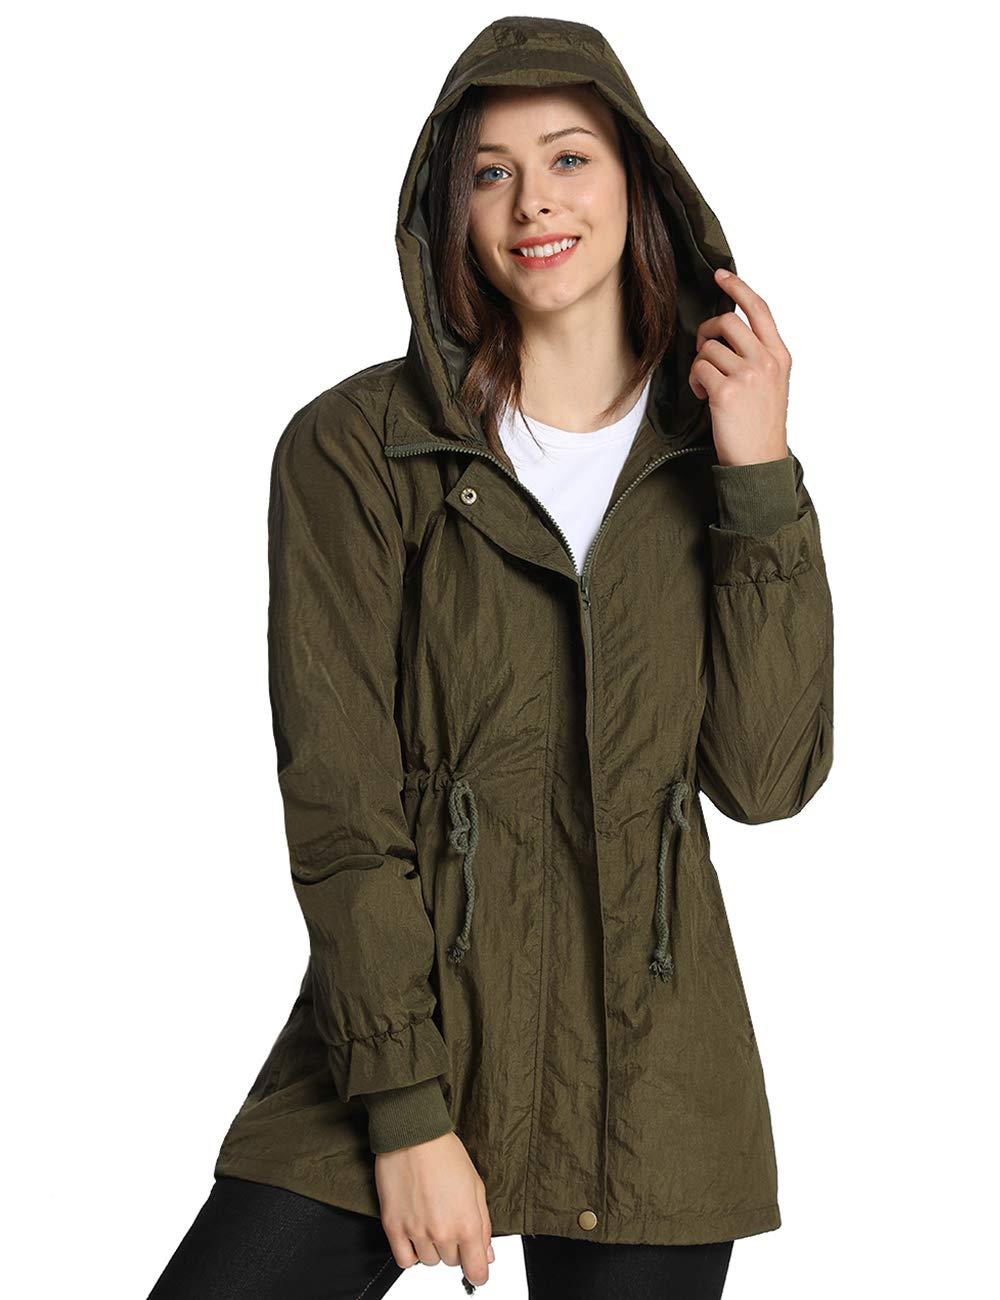 iloveSIA Woman's Lightweight Rain Jackets Spring Spray-Proof Dust-Proof Outwear with Hood